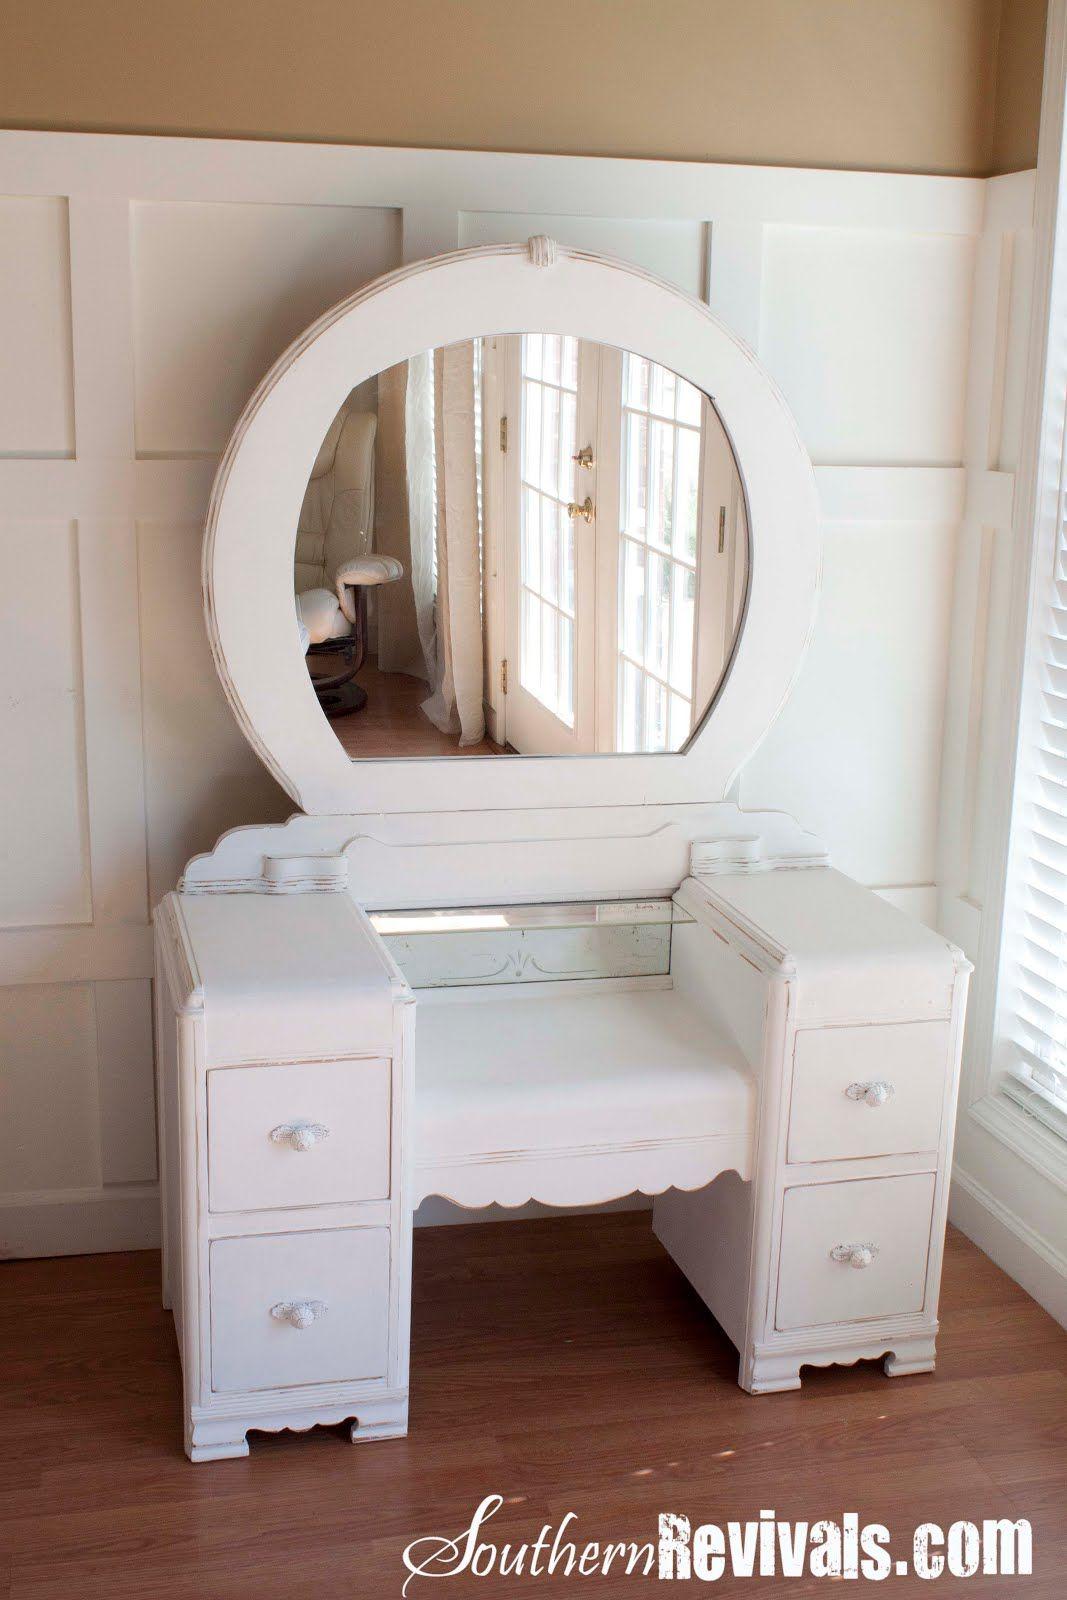 A 1940s Vanity Dresser Mirror Revival